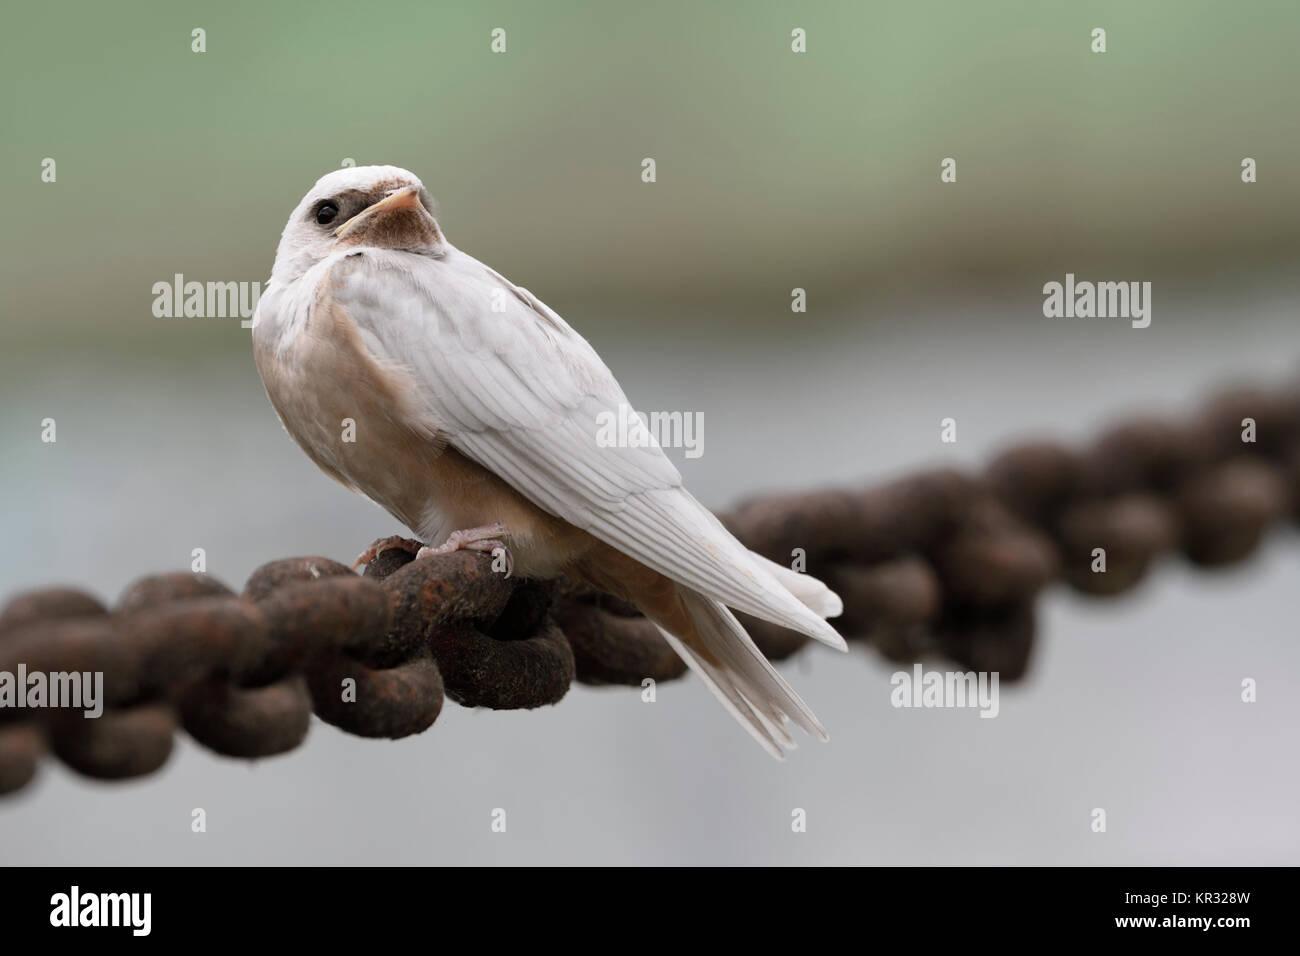 Barn Swallow / Rauchschwalbe ( Hirundo rustica ), young, pigment defect, white plumage, leucistic, leucism, perched - Stock Image